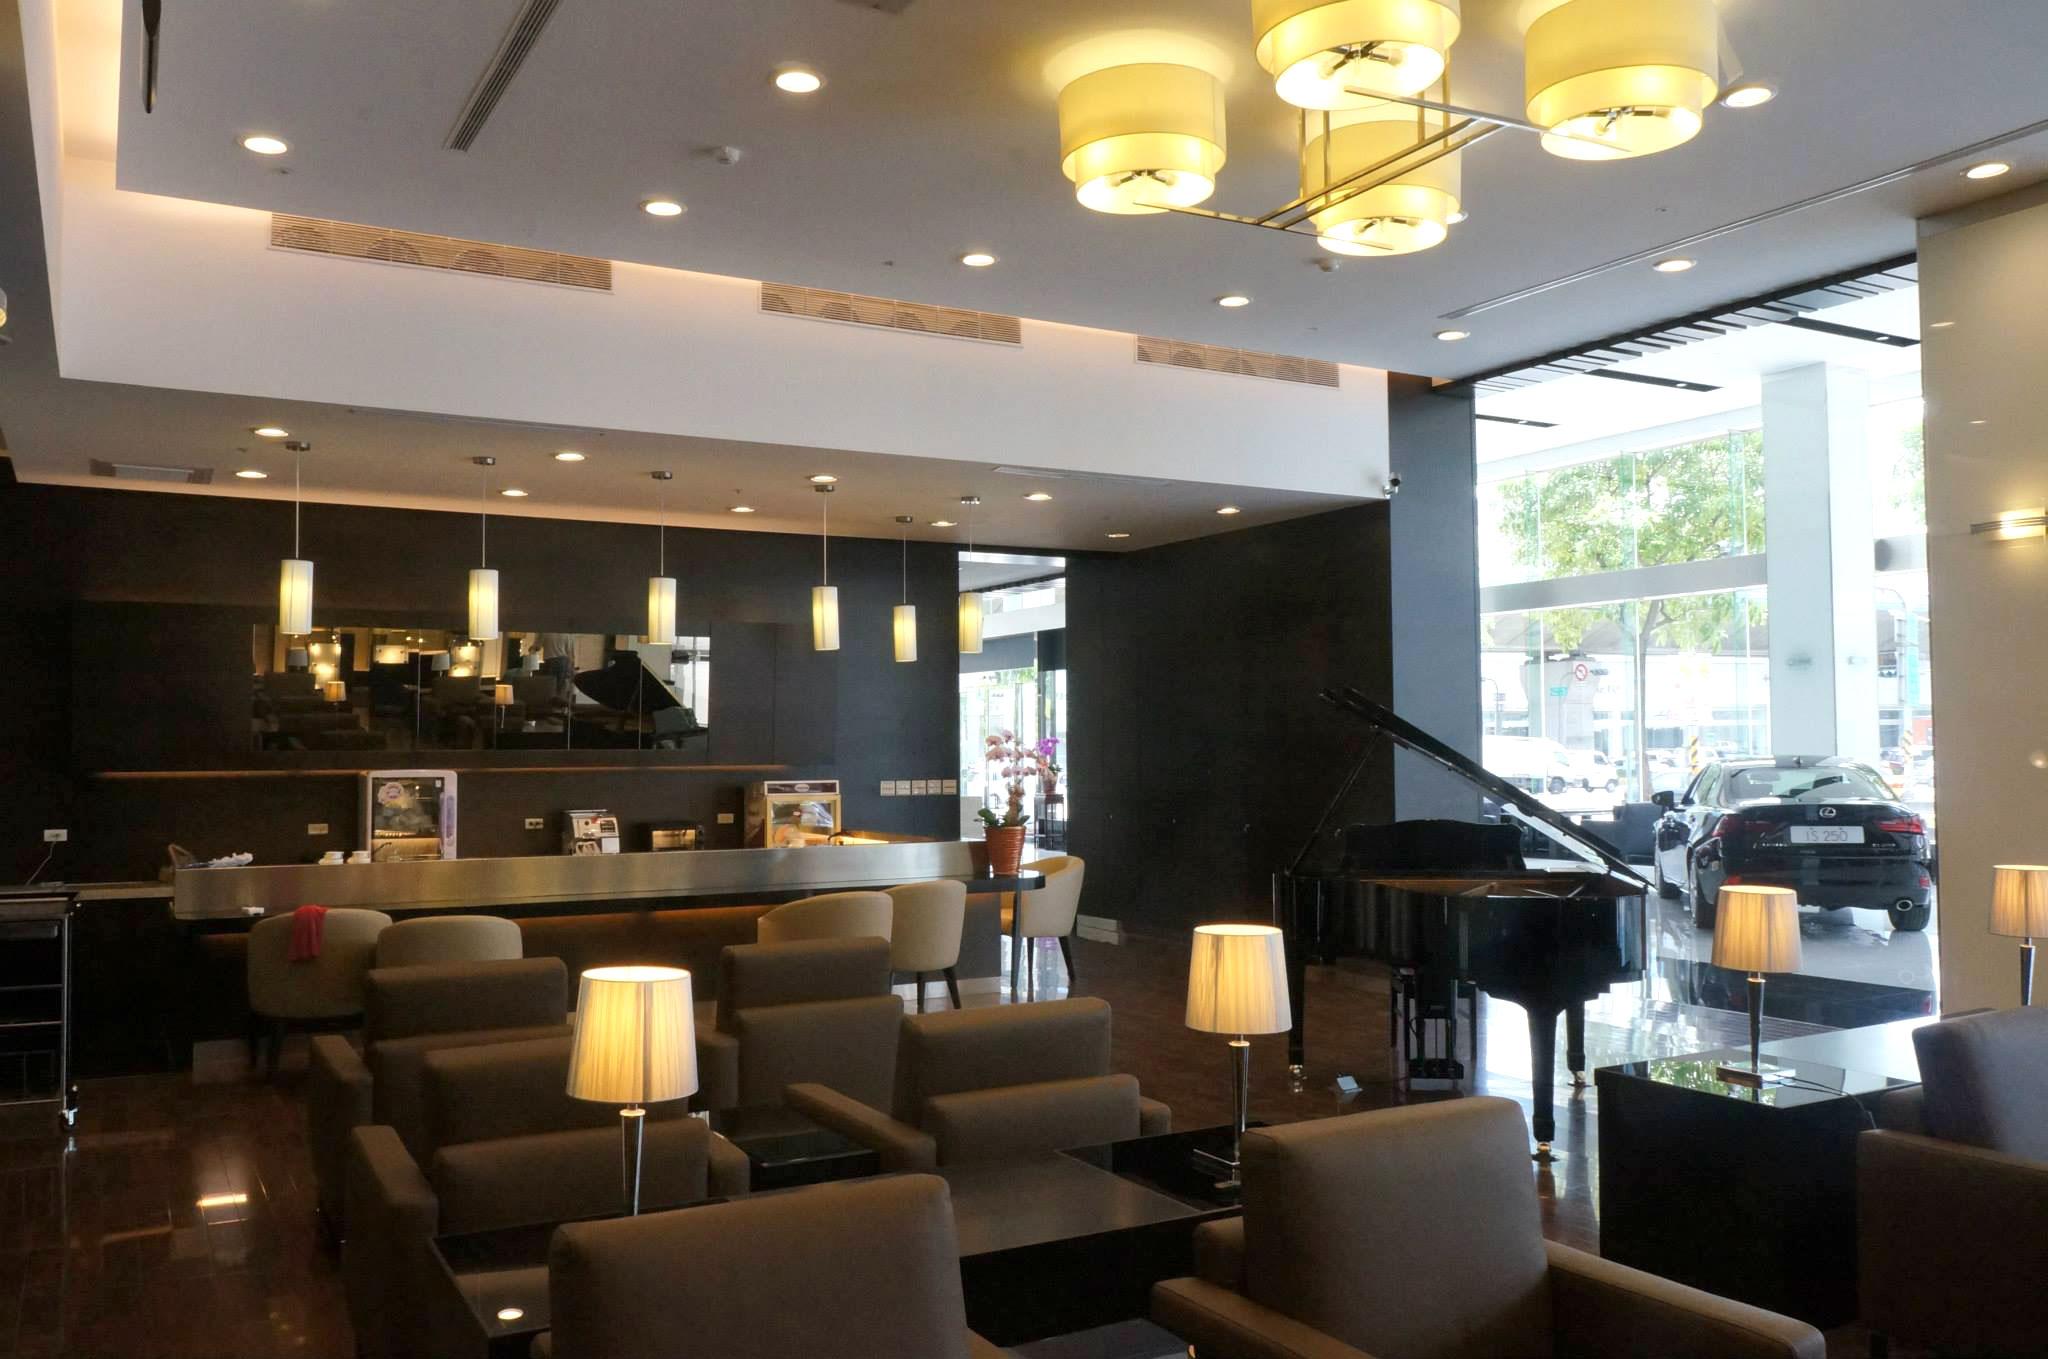 Lexus Lfa For Sale >> World's Largest Lexus Showroom Opens in Taiwan | Lexus ...